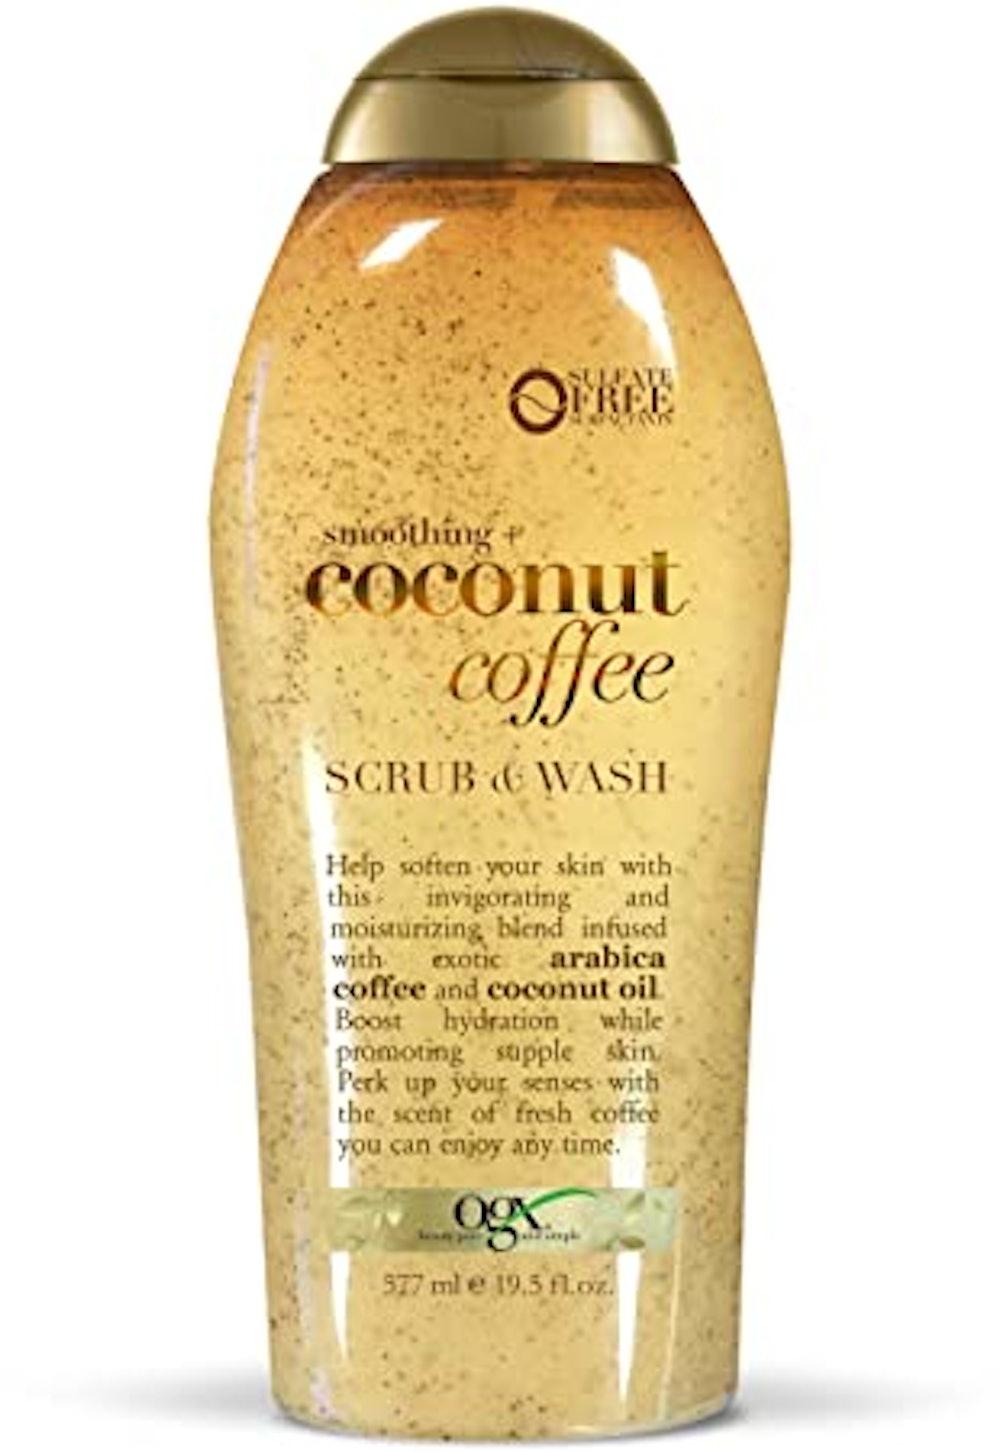 Coffee Scrub and Wash, Coconut